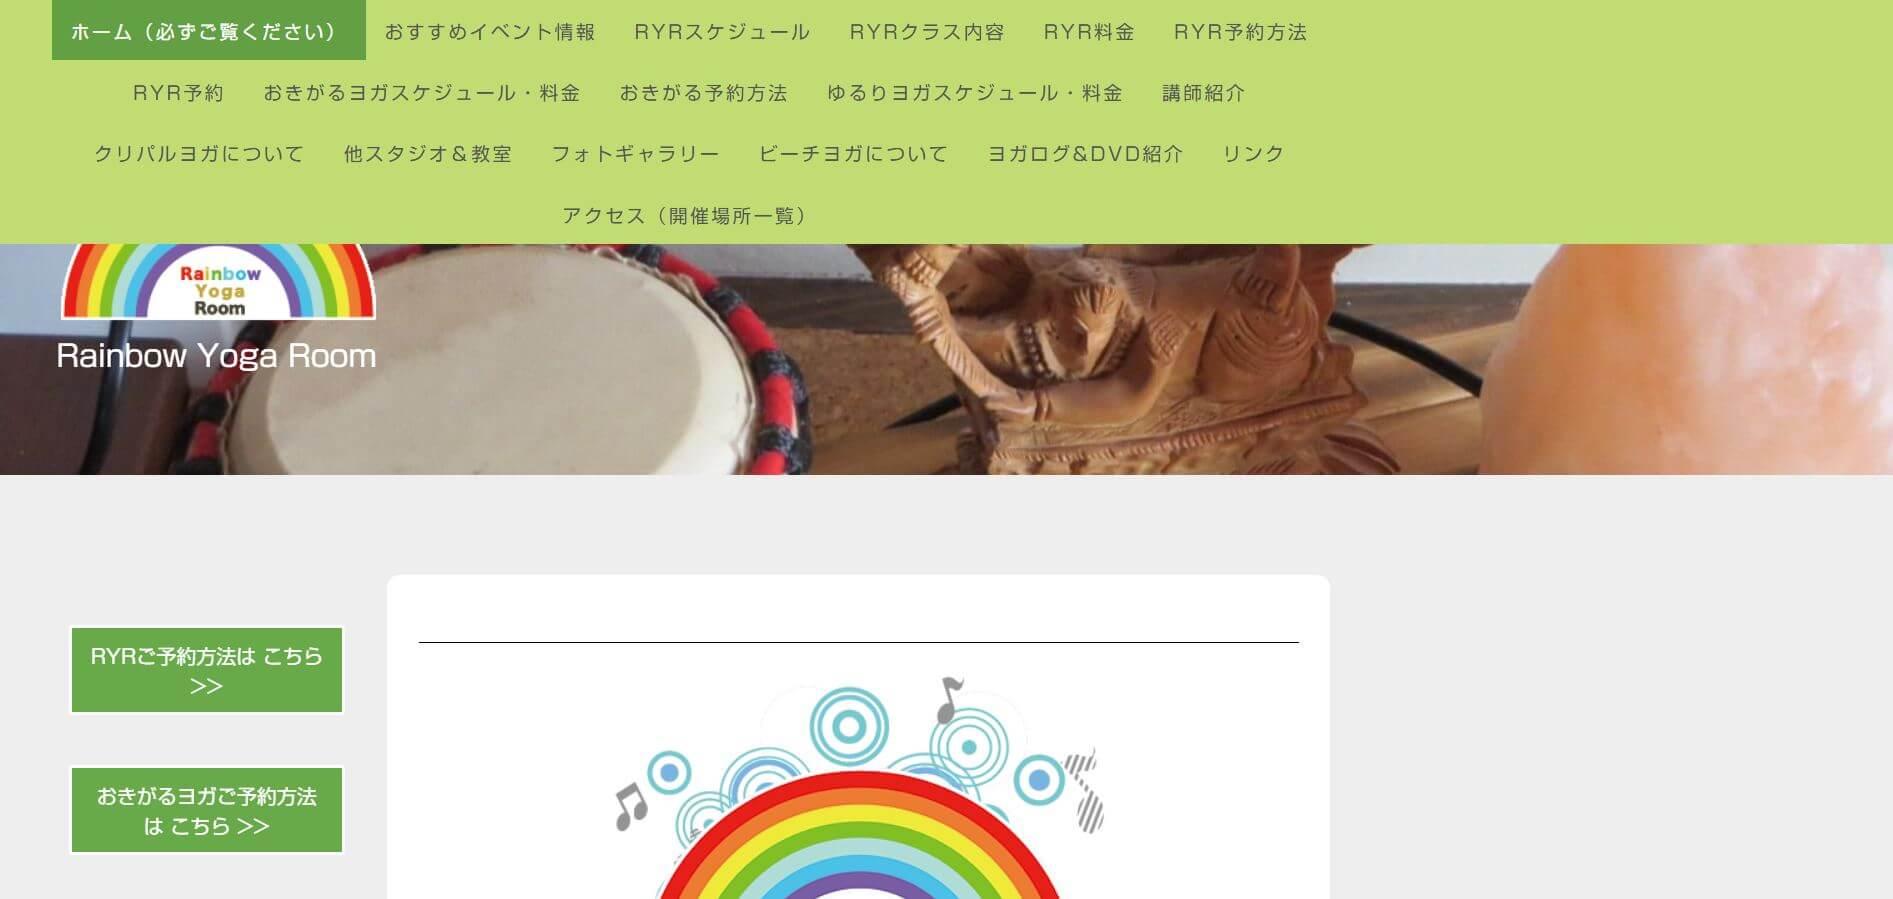 Rainbow Yoga Room(レインボーヨガルーム)